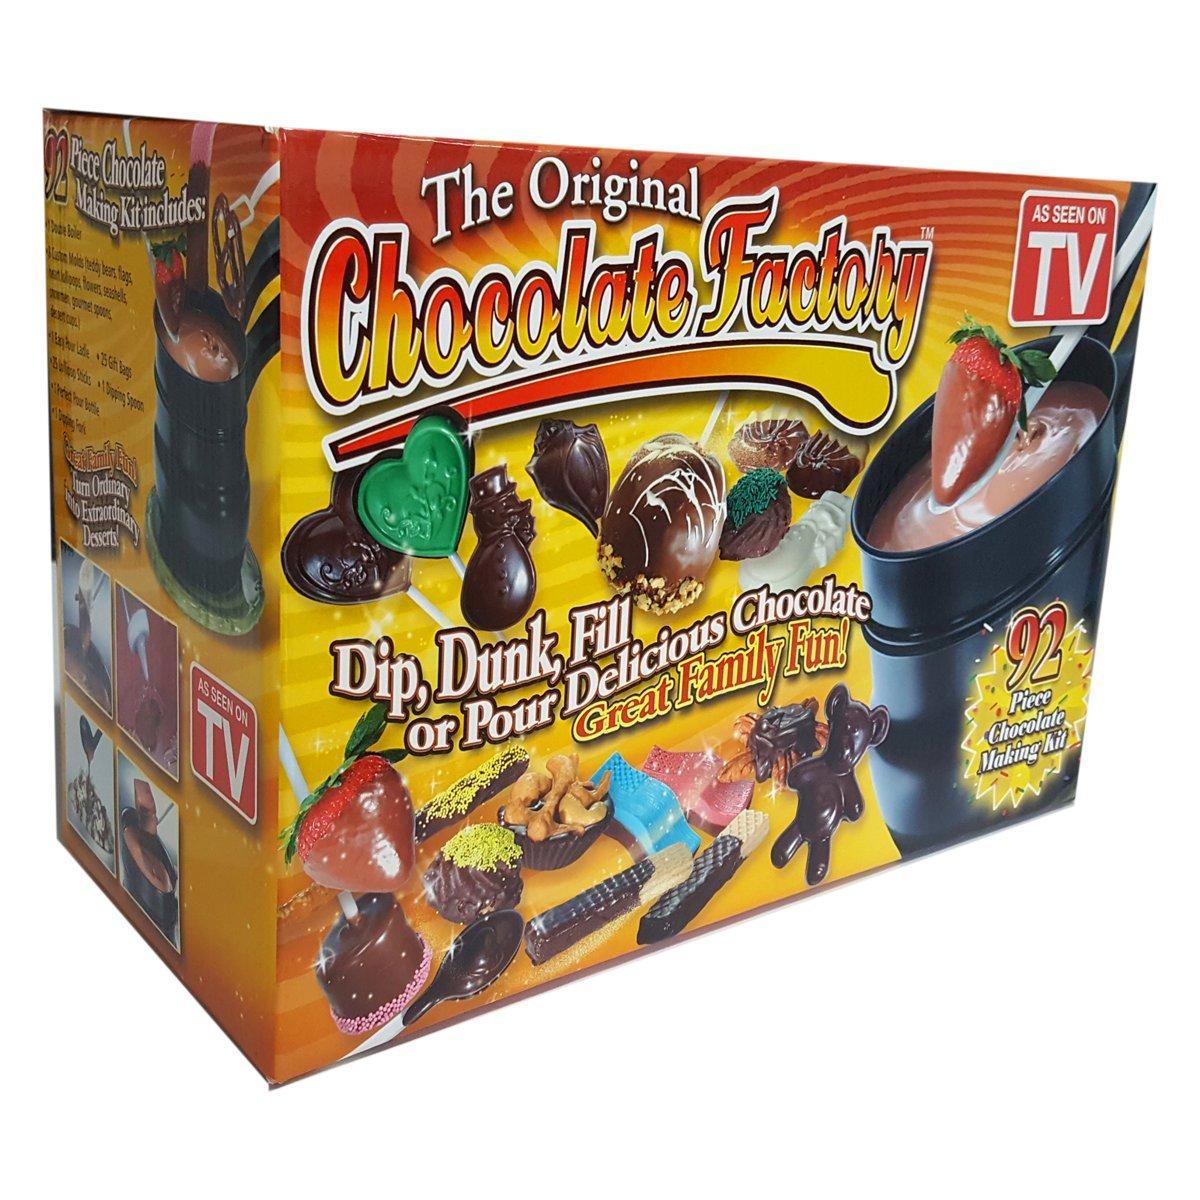 The Original Chocolate Factory Kit